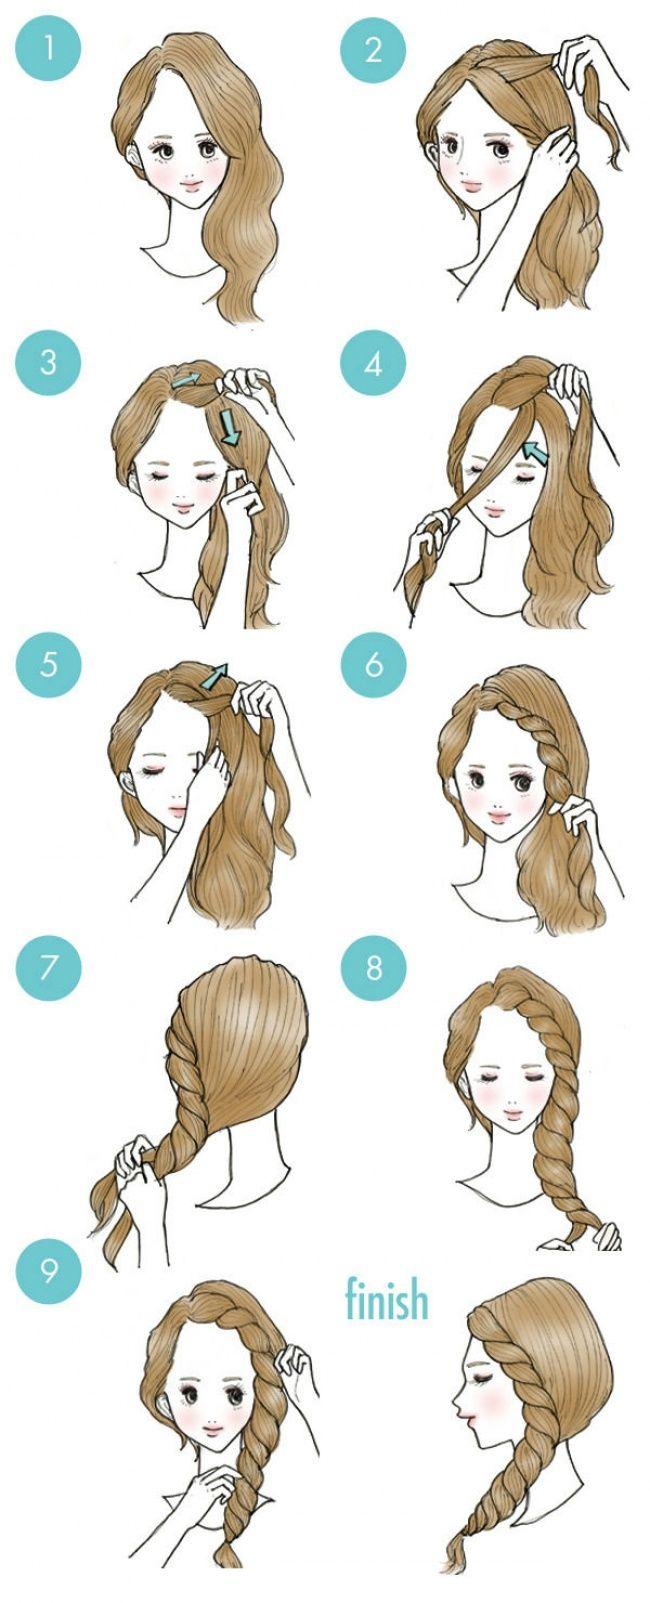 Pin by maja jas on hair pinterest hair style hair goals and